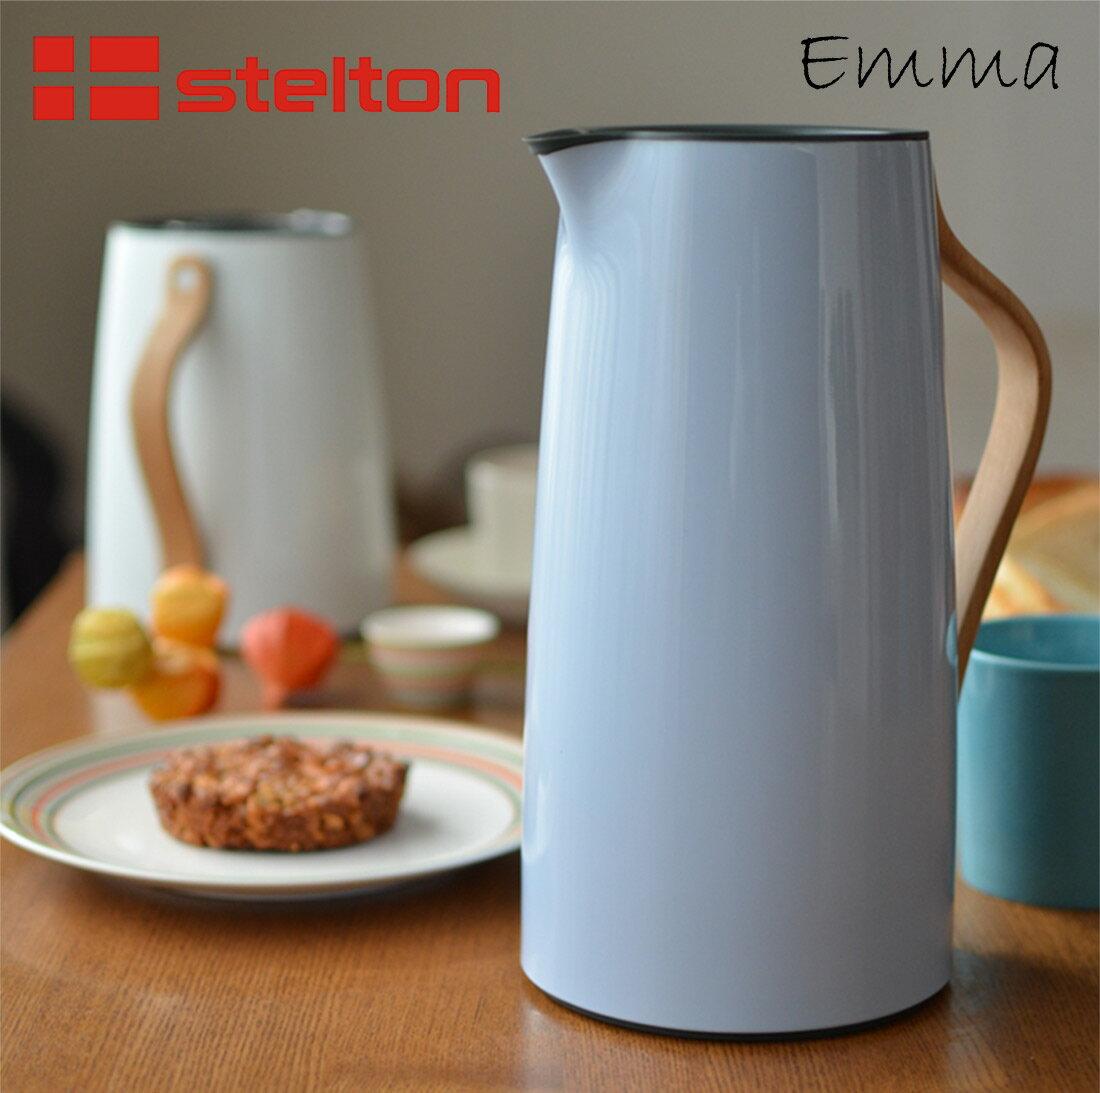 Stelton/ステルトン Emma/エマ バキュームジャグ Tea 1L & Coffee 1.2Lエンマ 魔法瓶 水筒 ジャグ 北欧